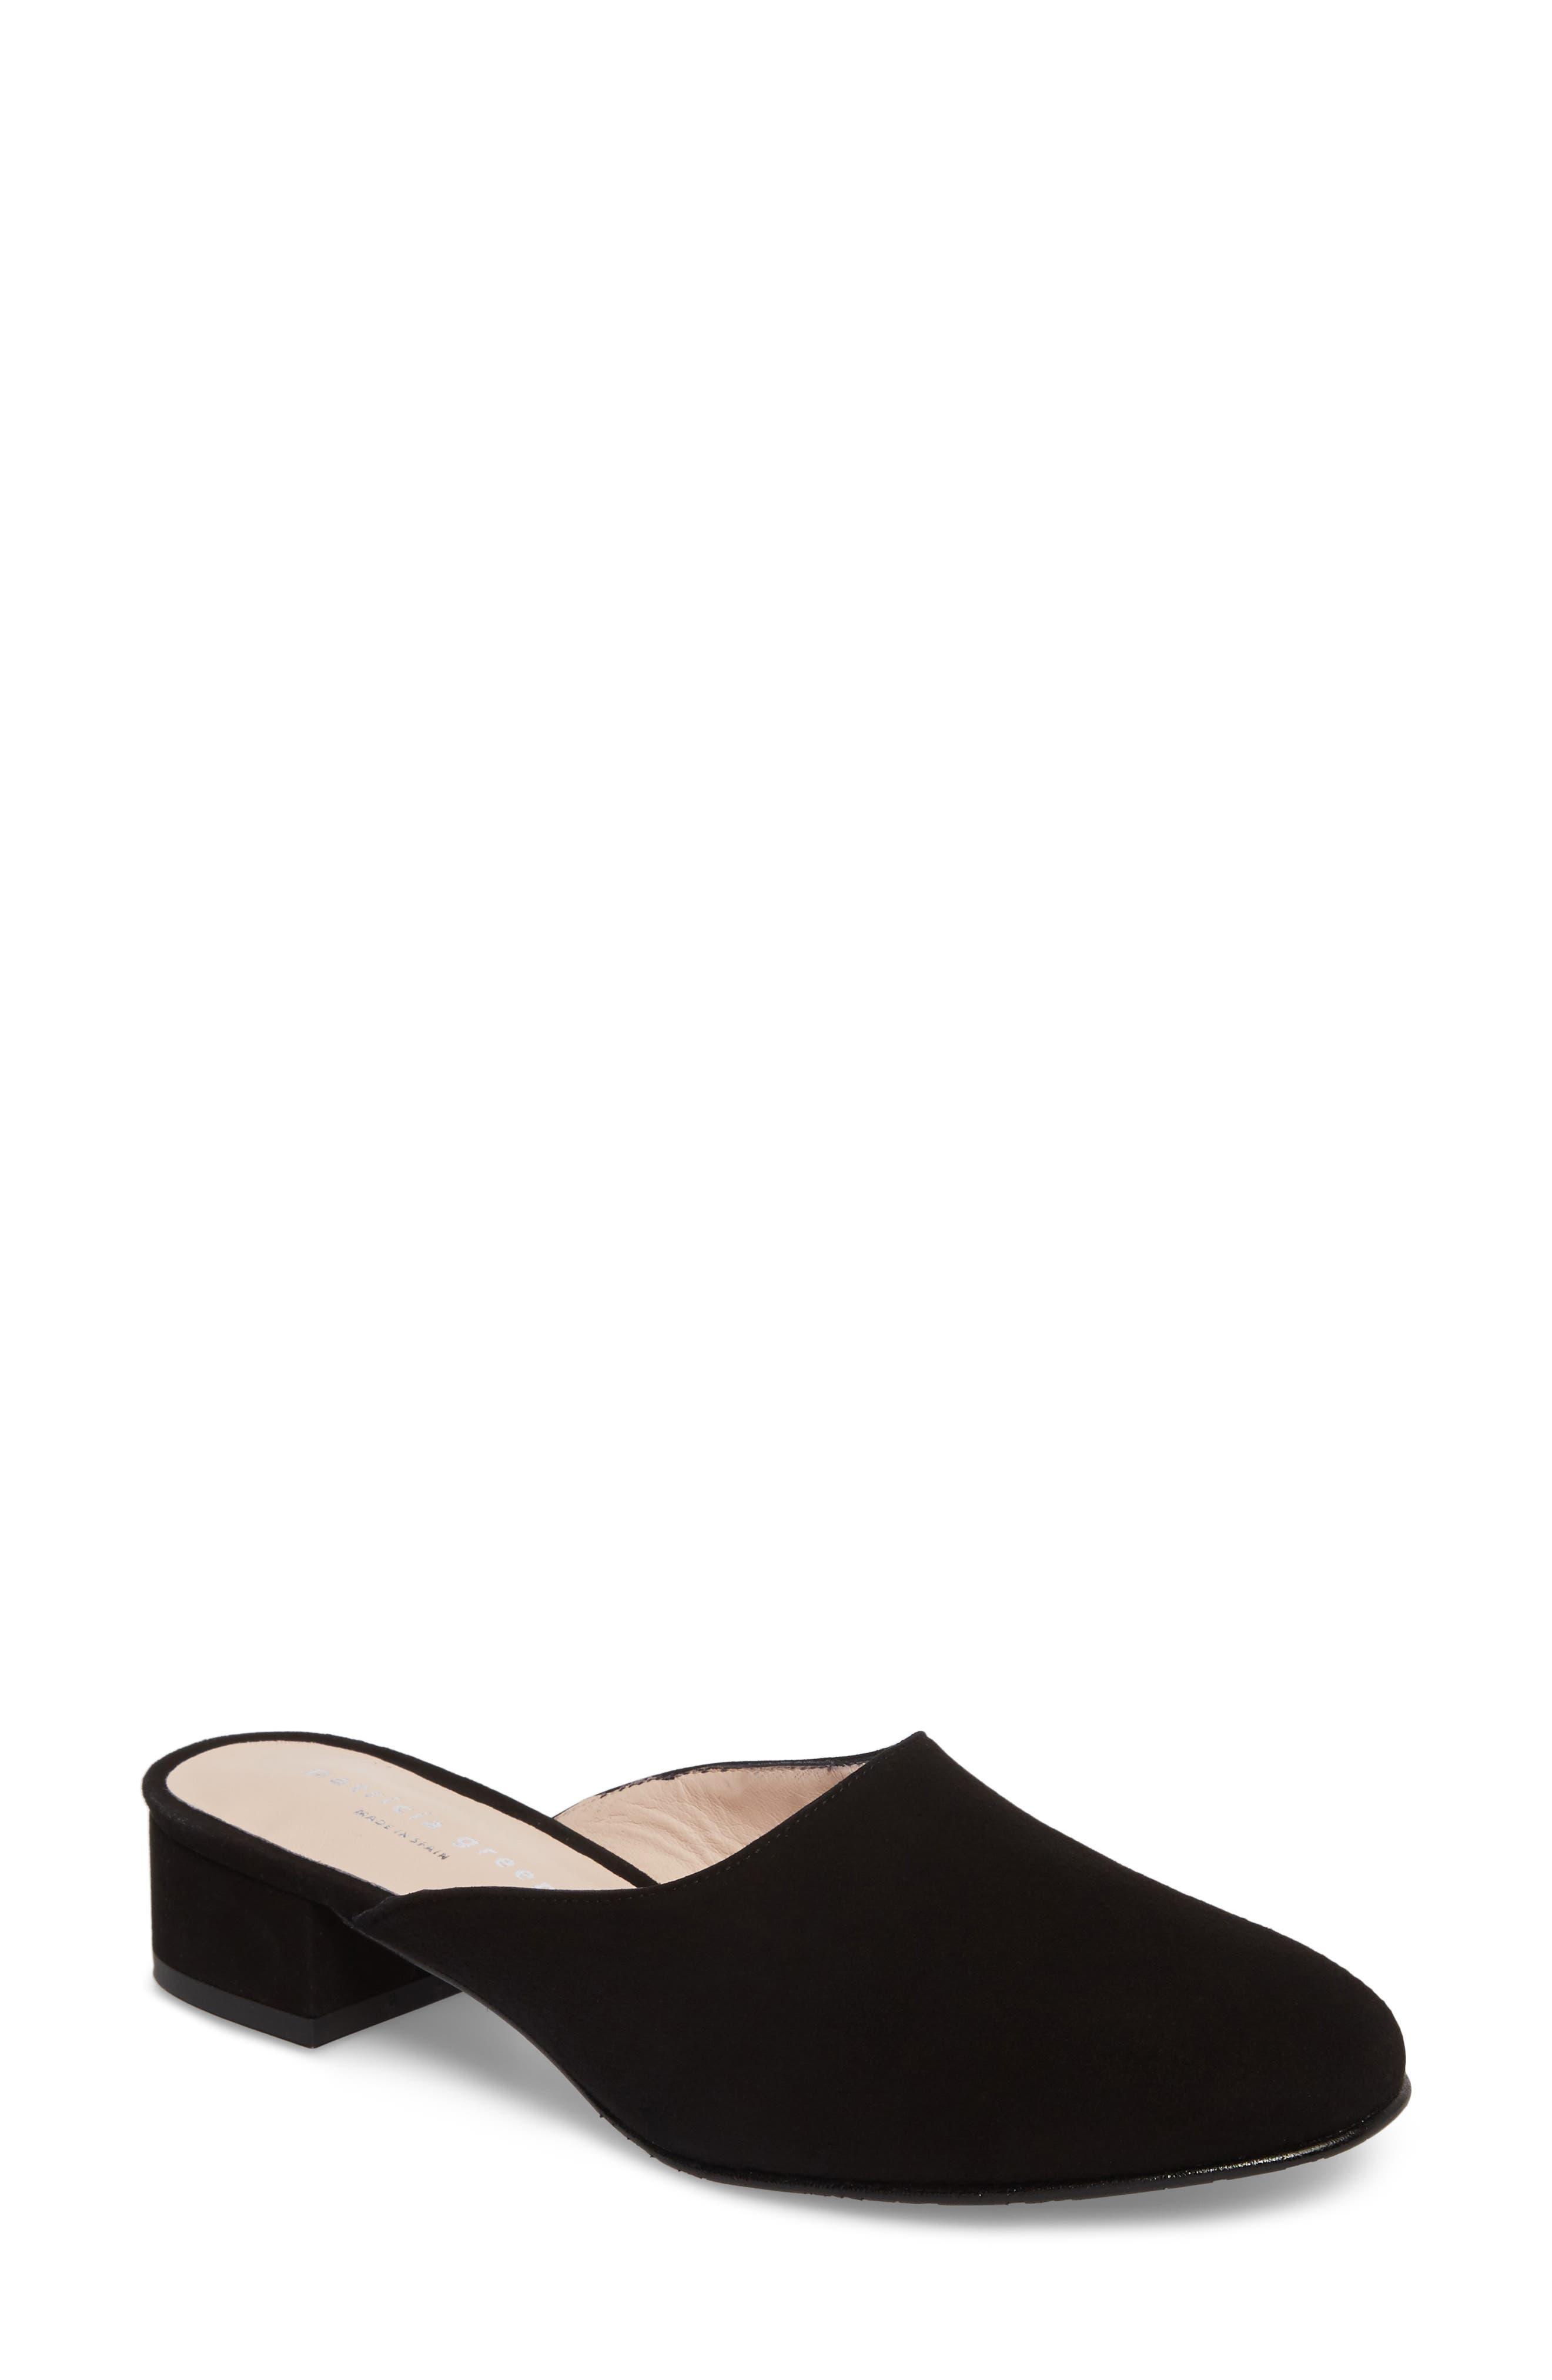 Ava Block Heel Mule,                         Main,                         color, Black Suede